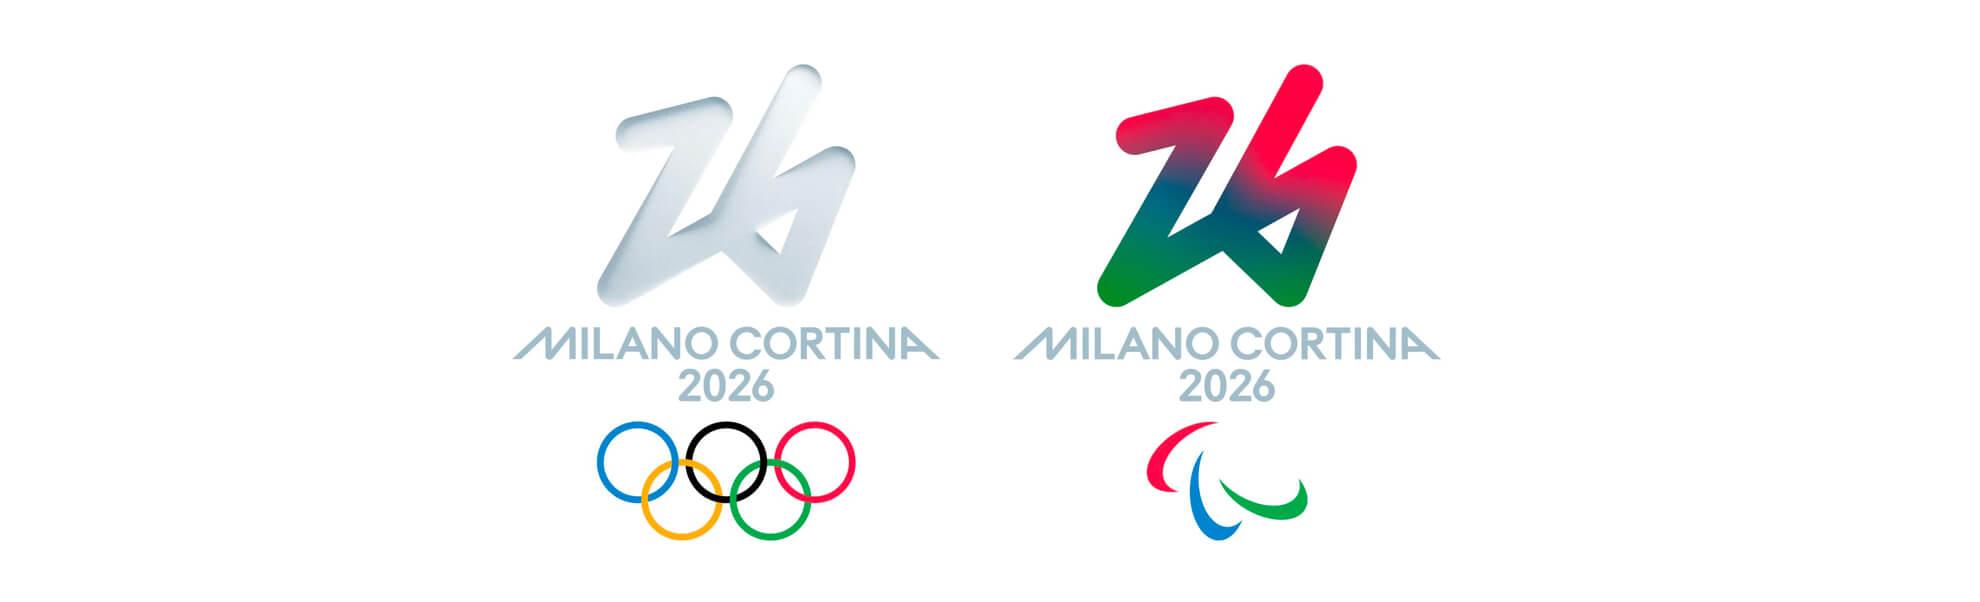 Milano Cortina 2026 loga